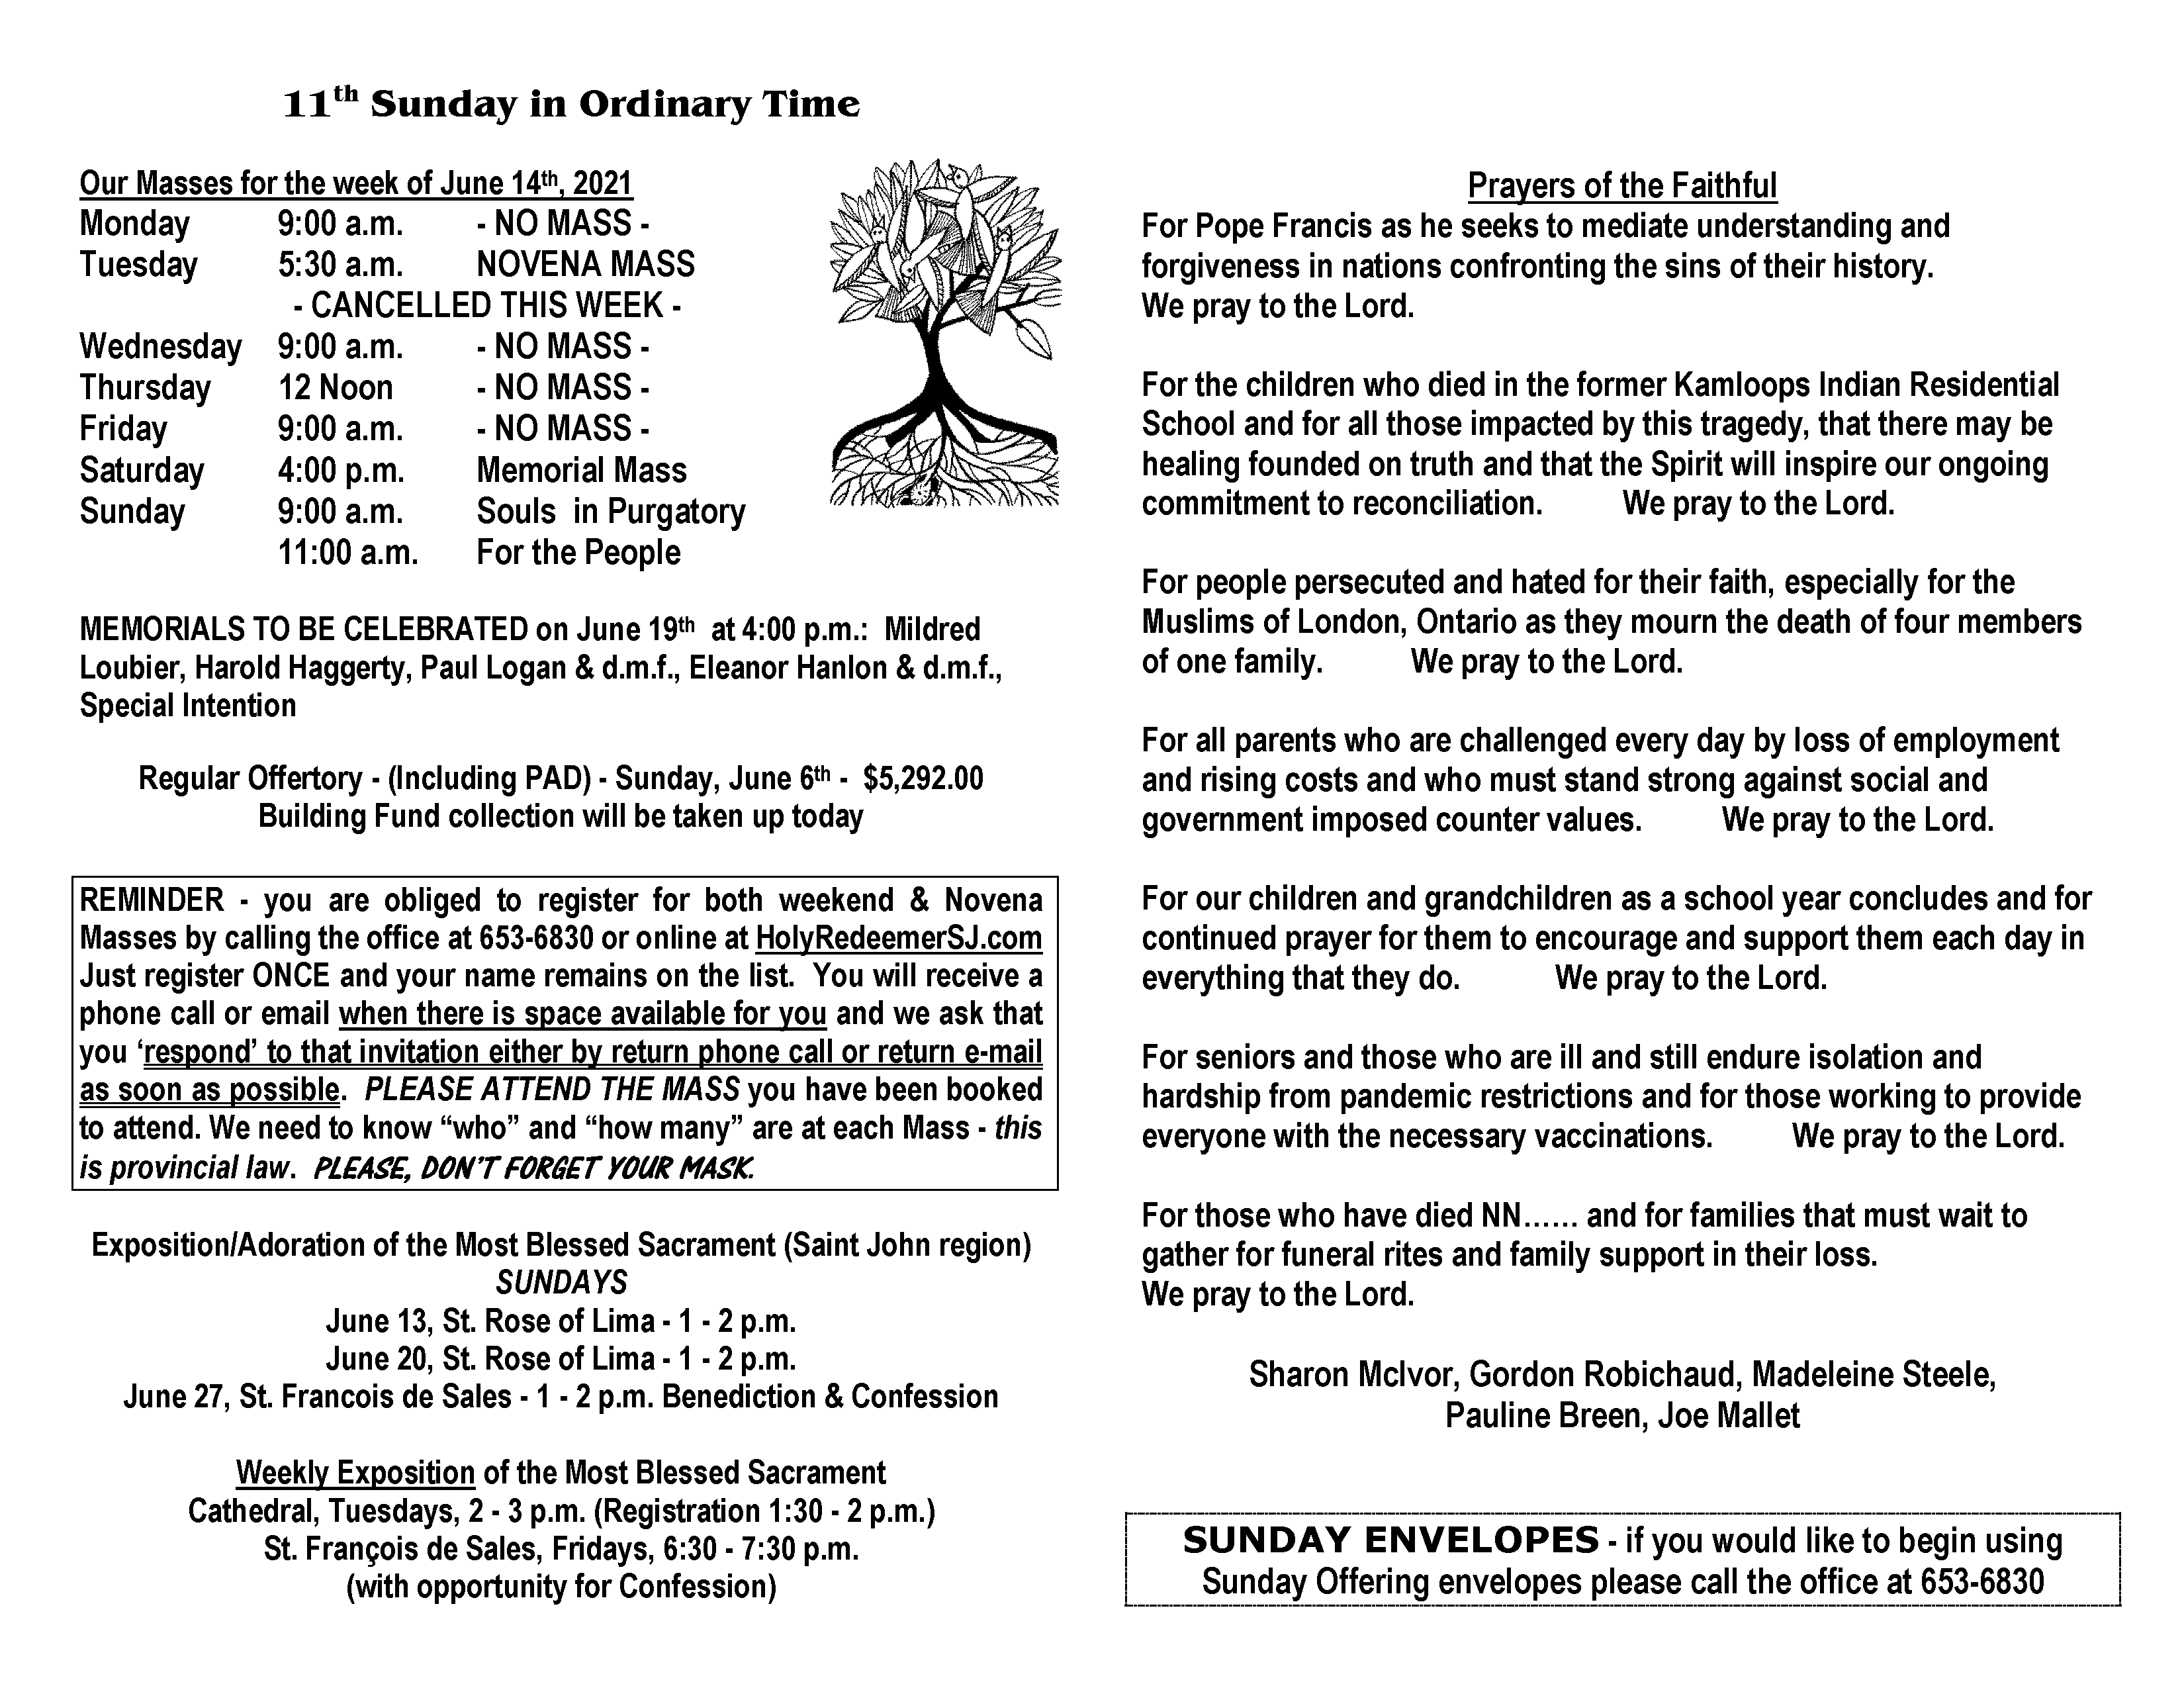 06-13-21